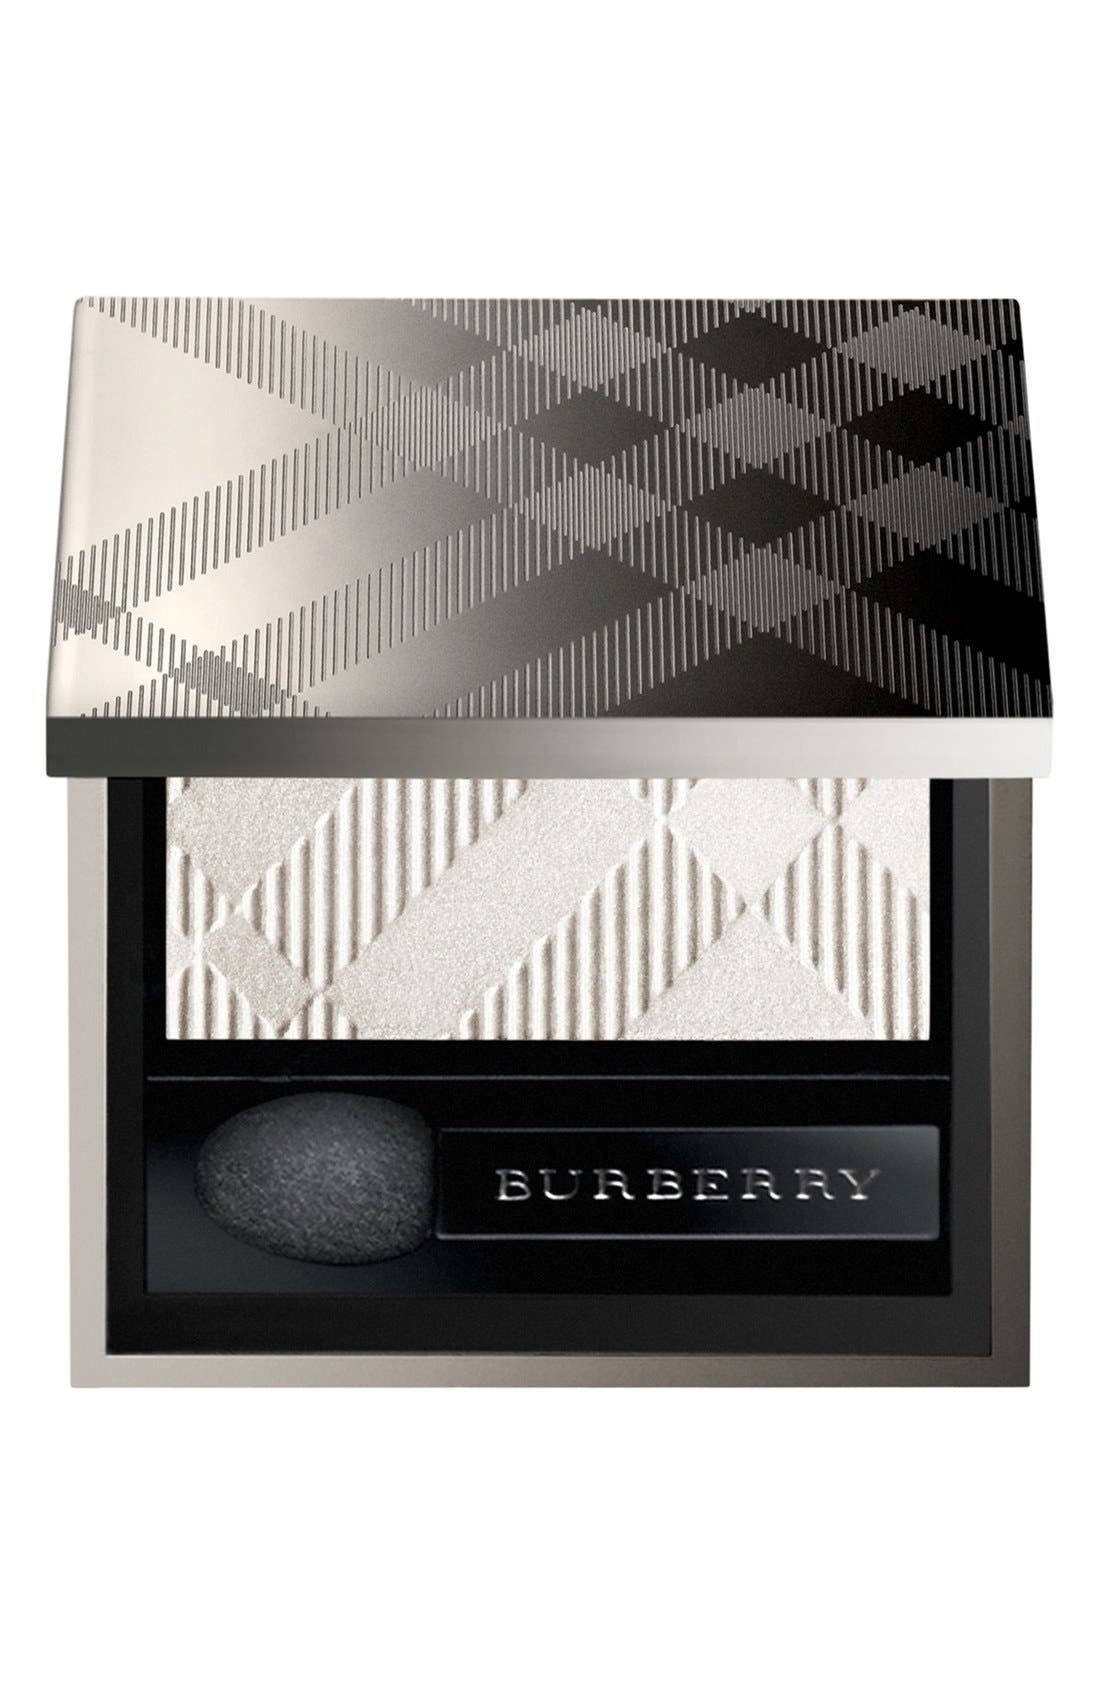 Burberry Beauty 'Eye Colour - Wet & Dry Glow' Eyeshadow